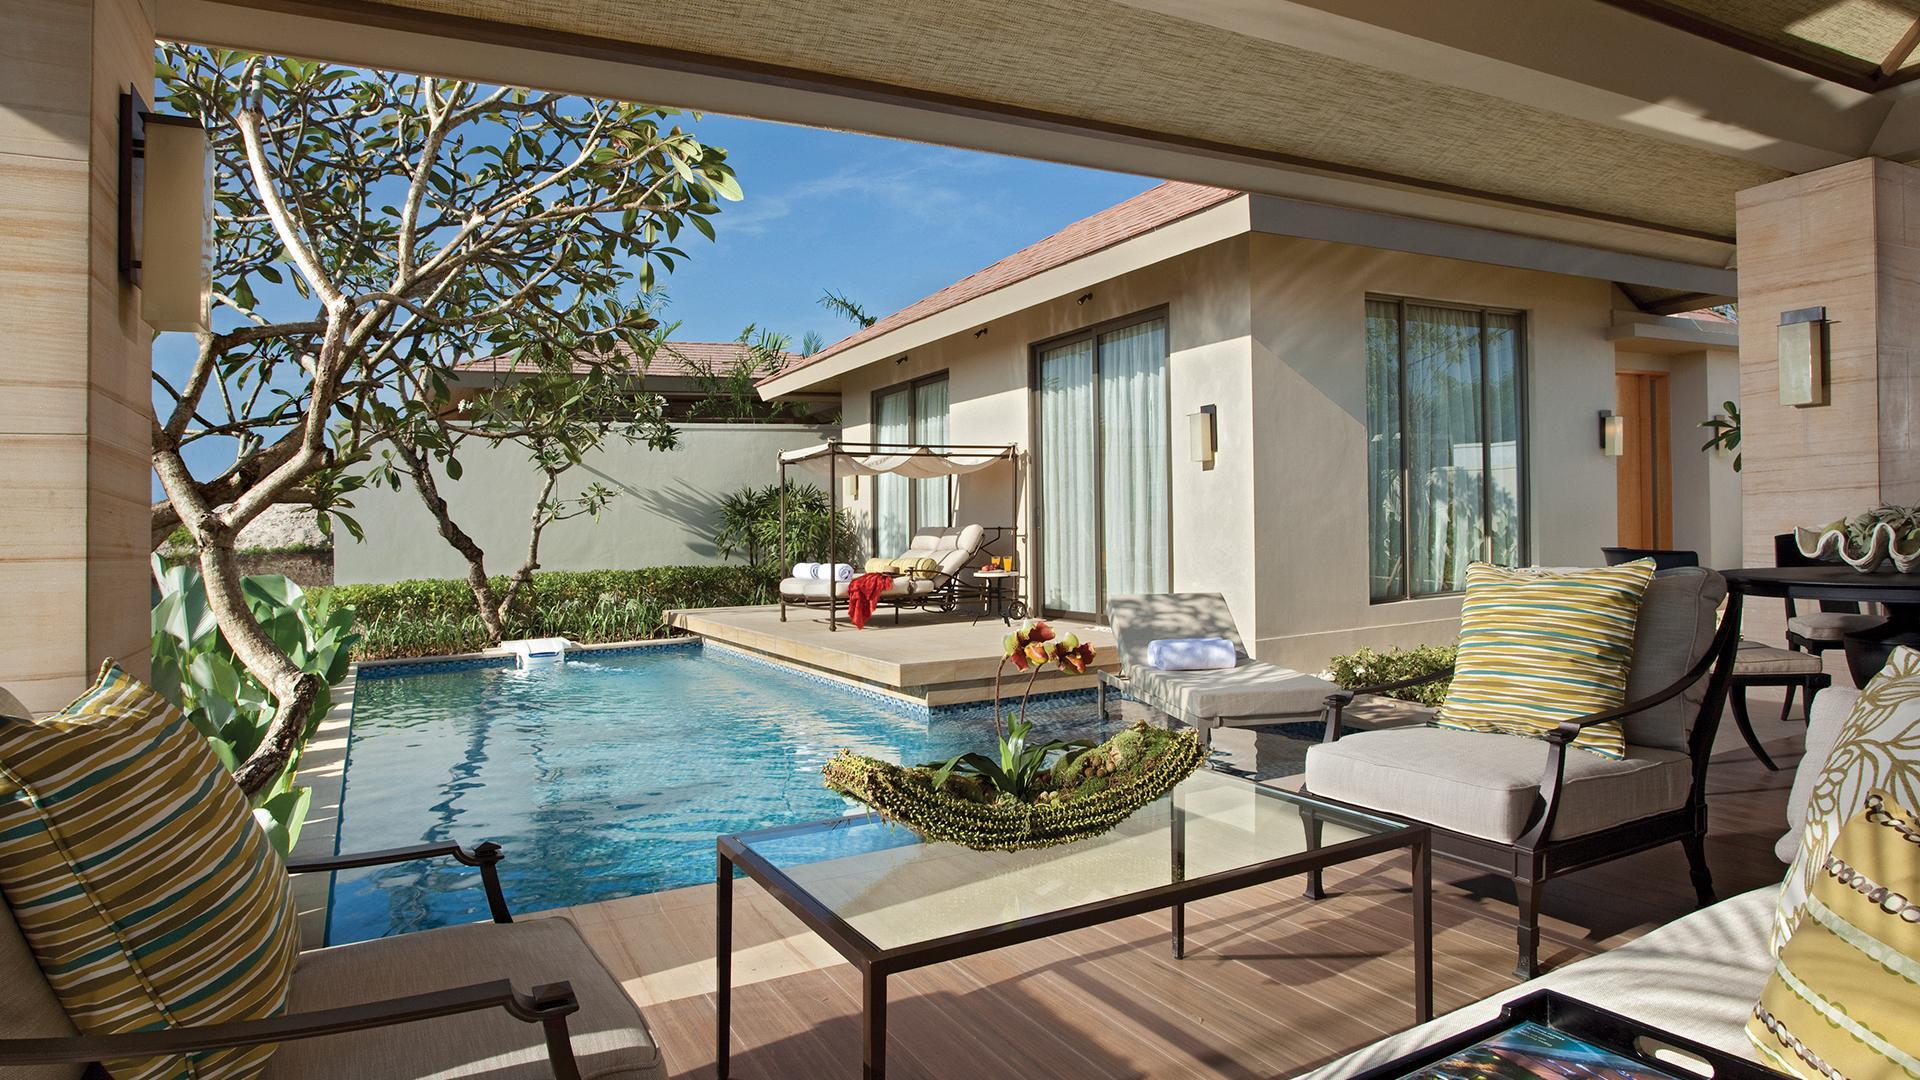 One-Bedroom Ocean Pool Villa image 1 at Mulia Villas by Kabupaten Badung, Bali, Indonesia